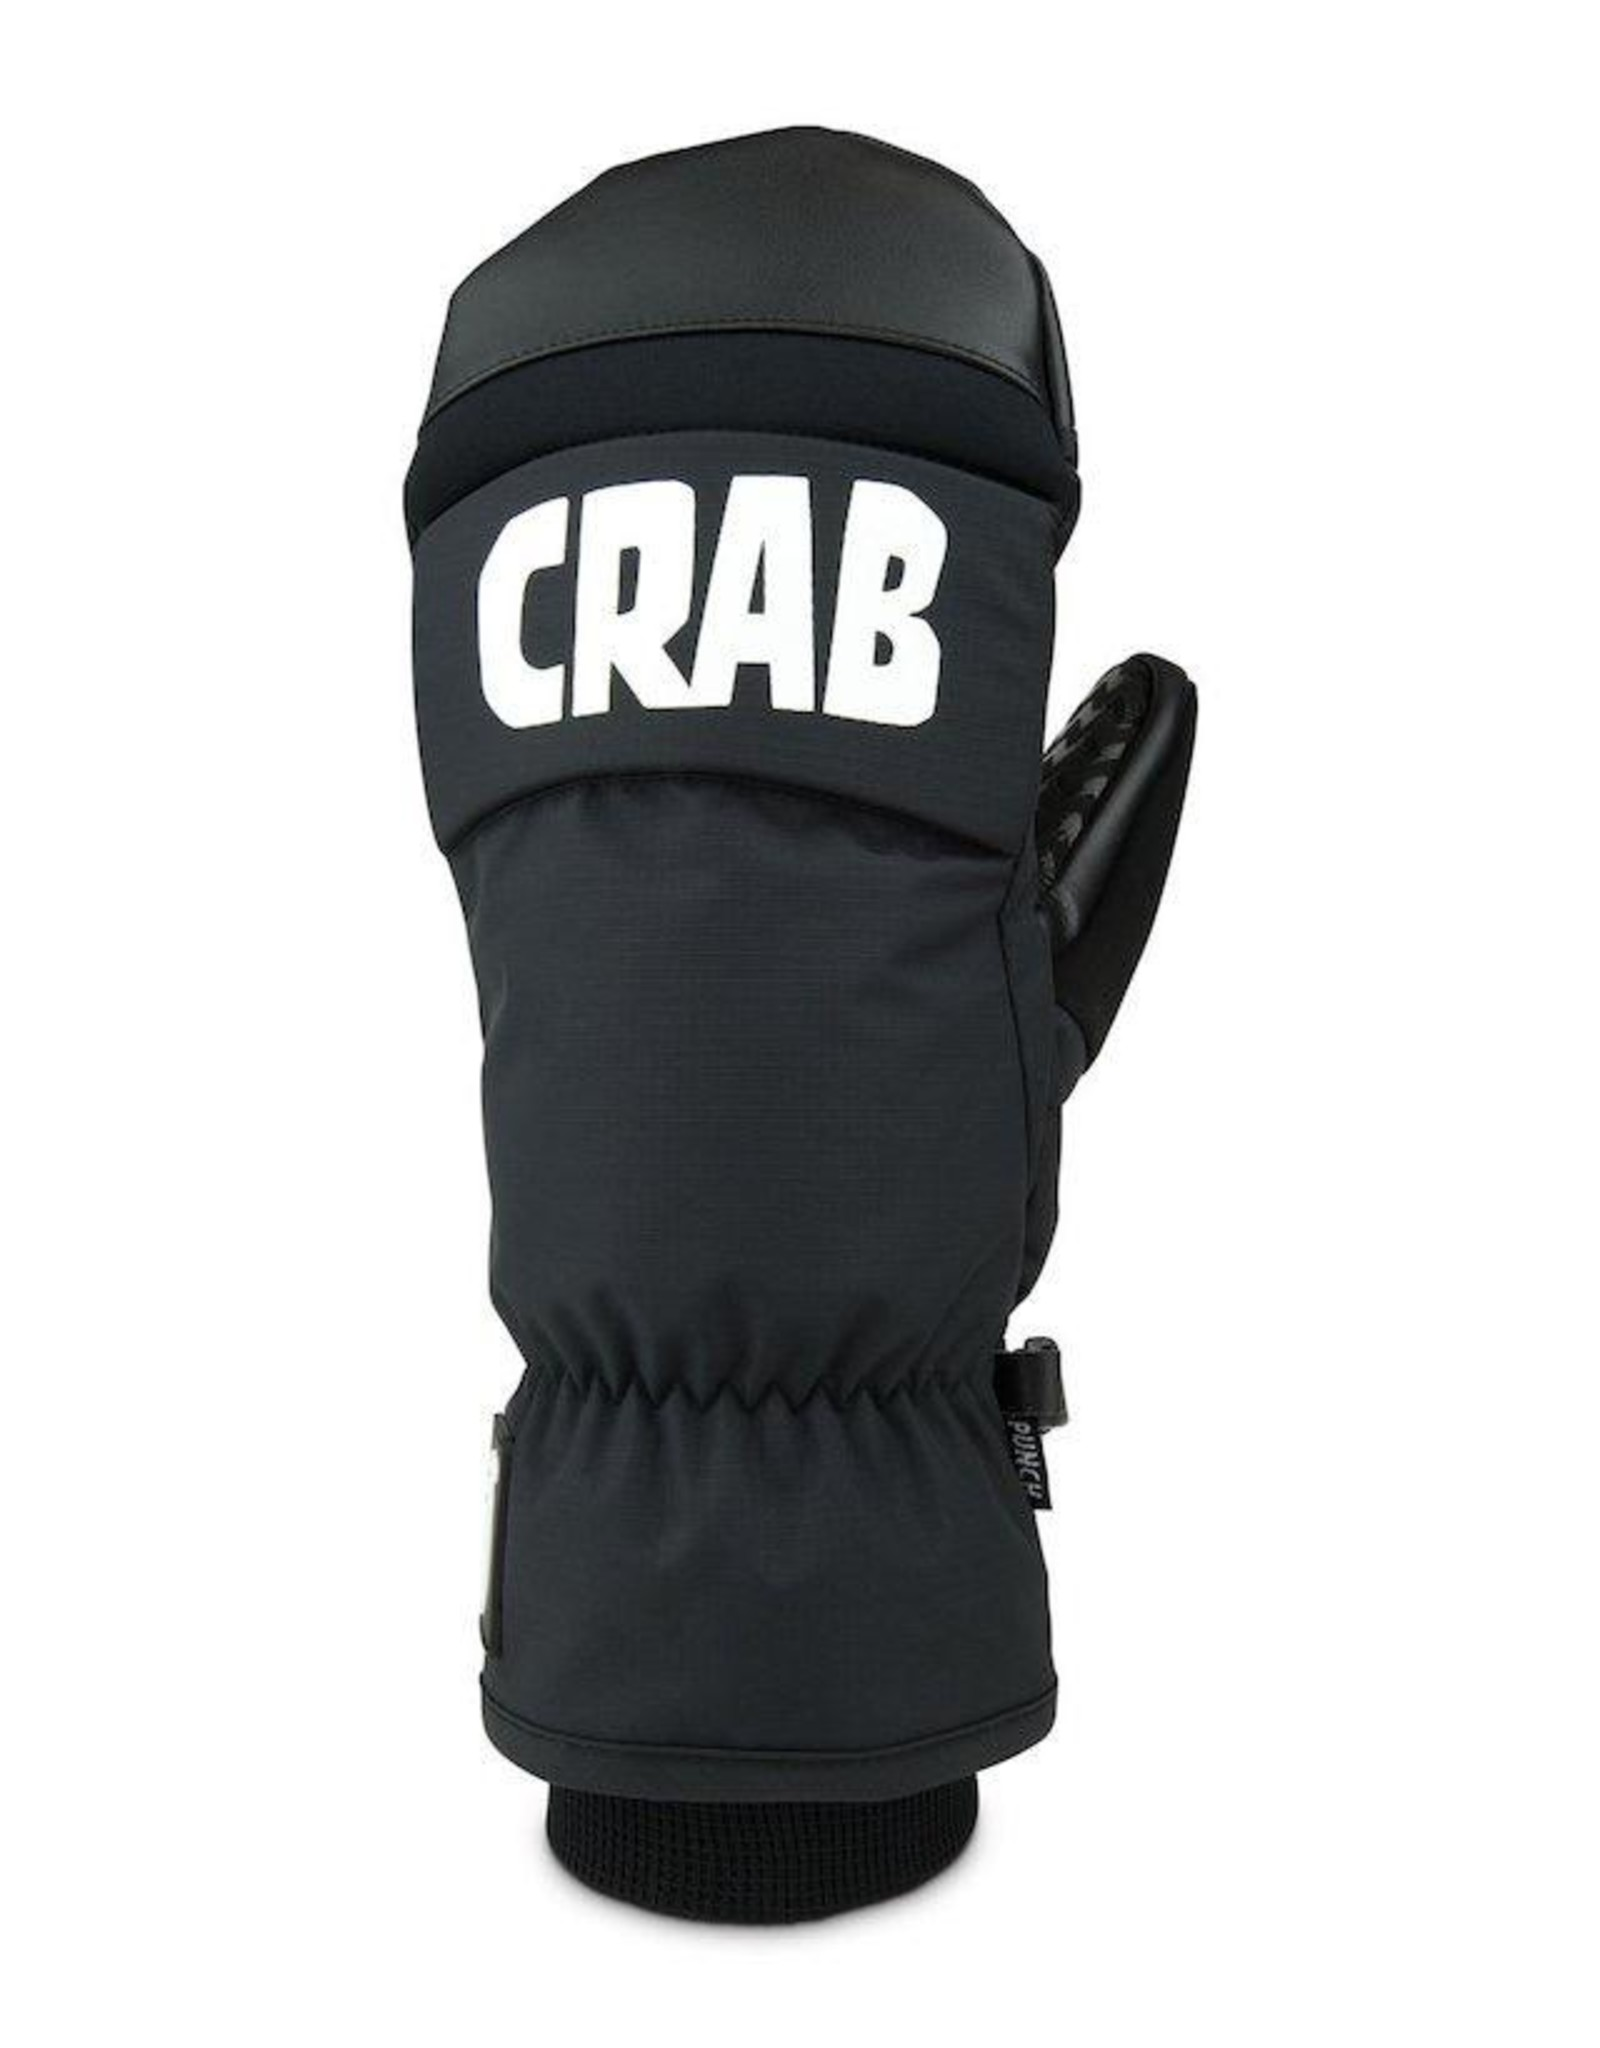 Crab Grab Crab Grab - Punch Mitt - S - Black